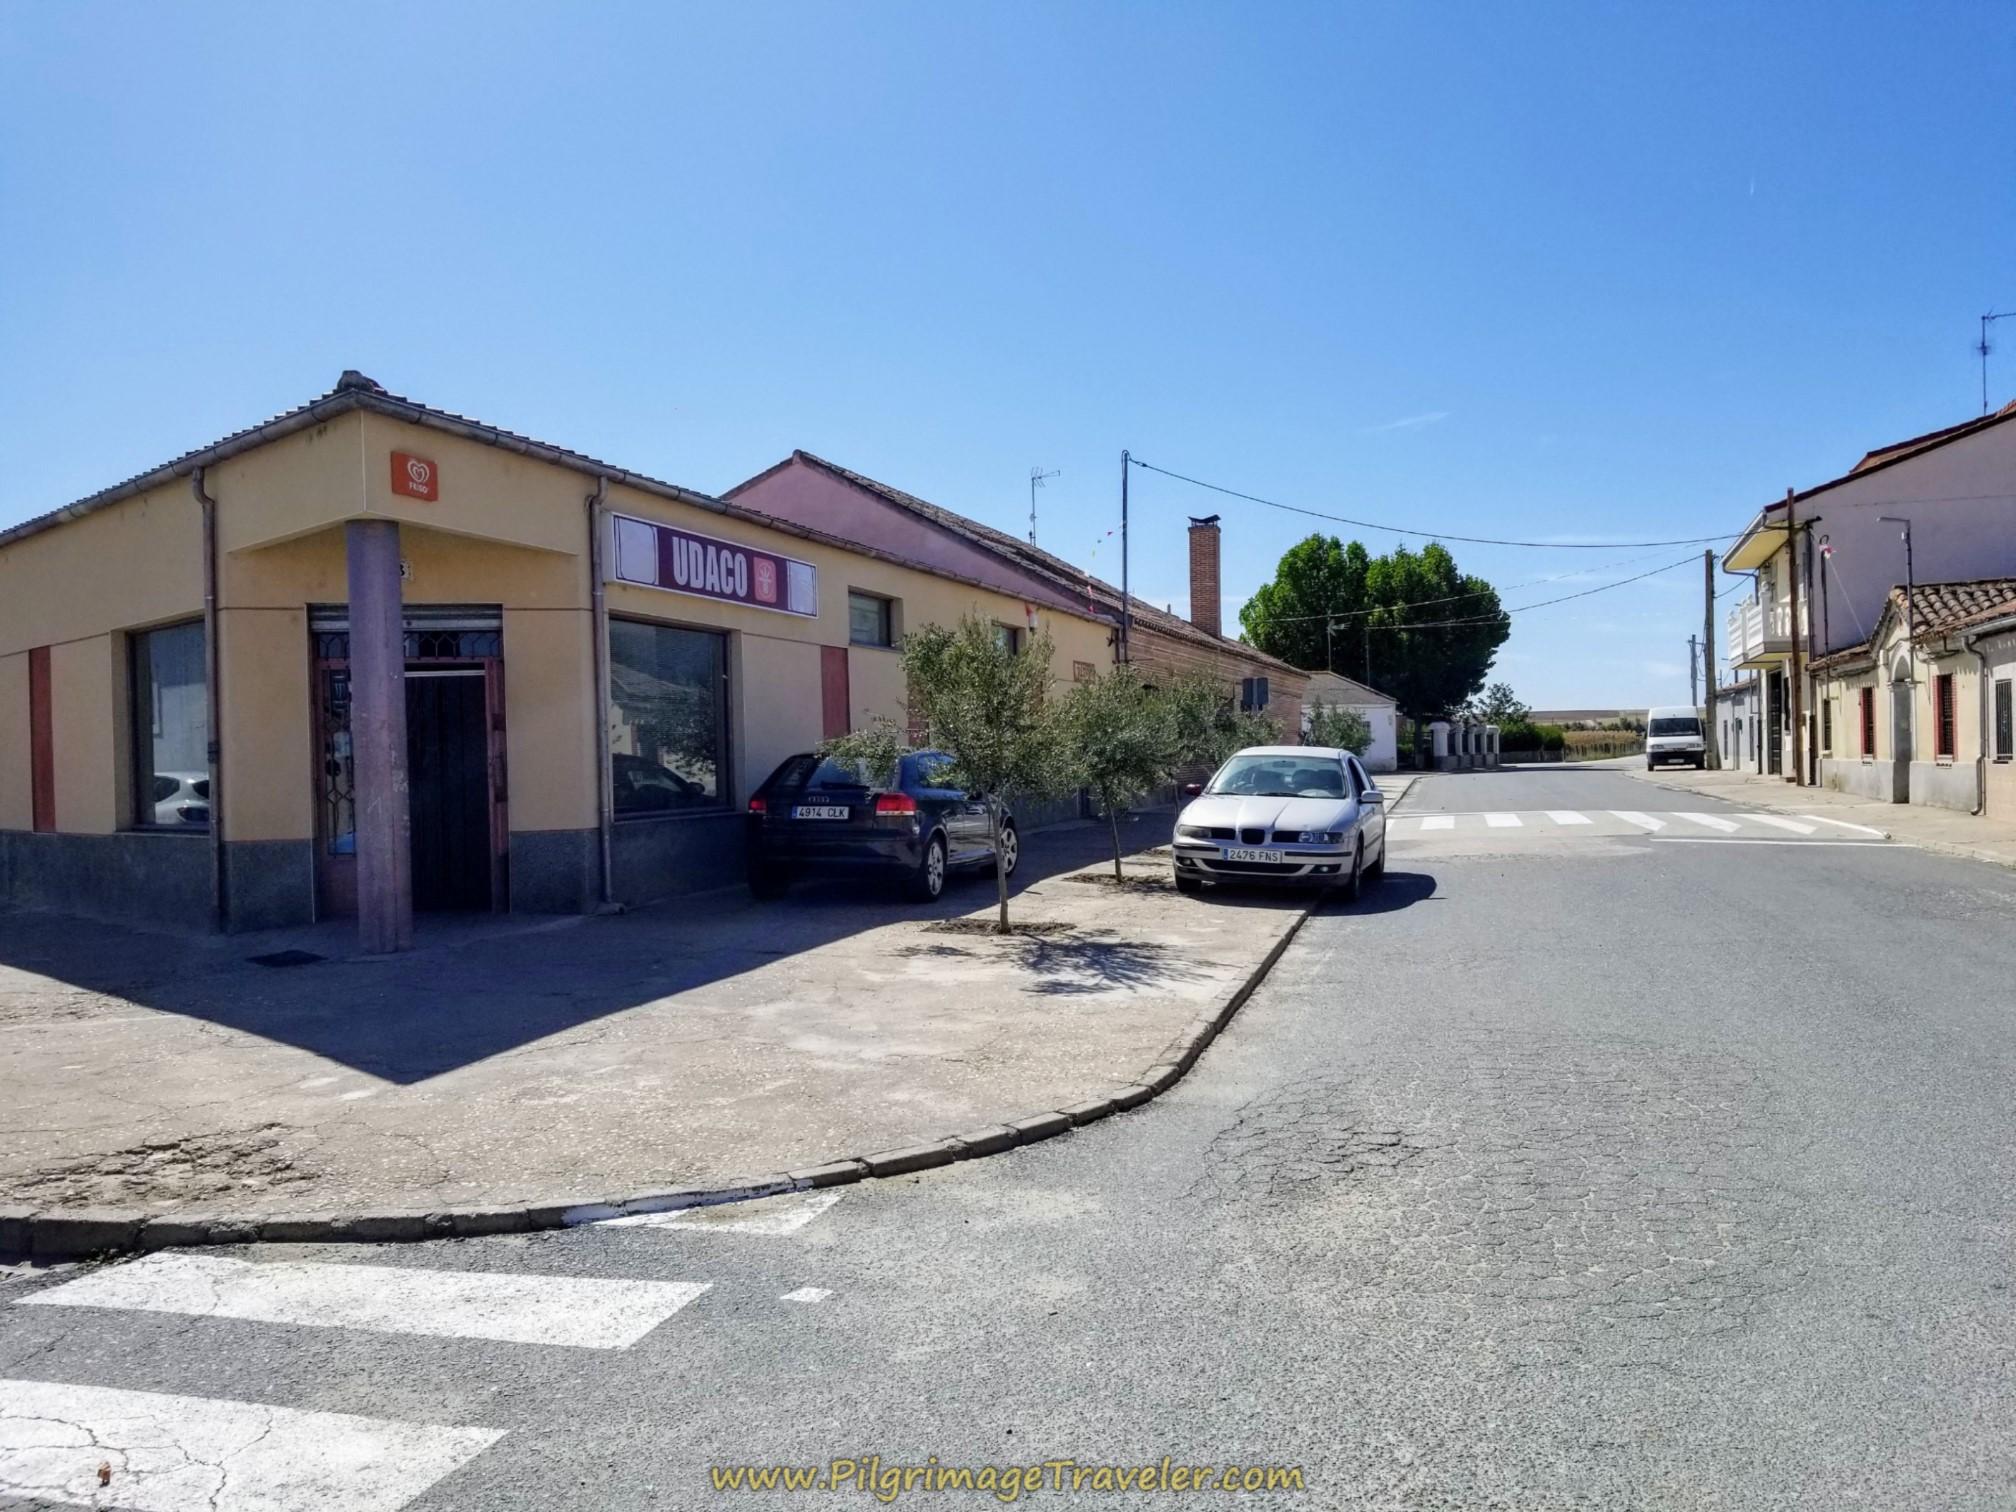 Pass the Supermercado San Juan on the journey to Alba de Tormes